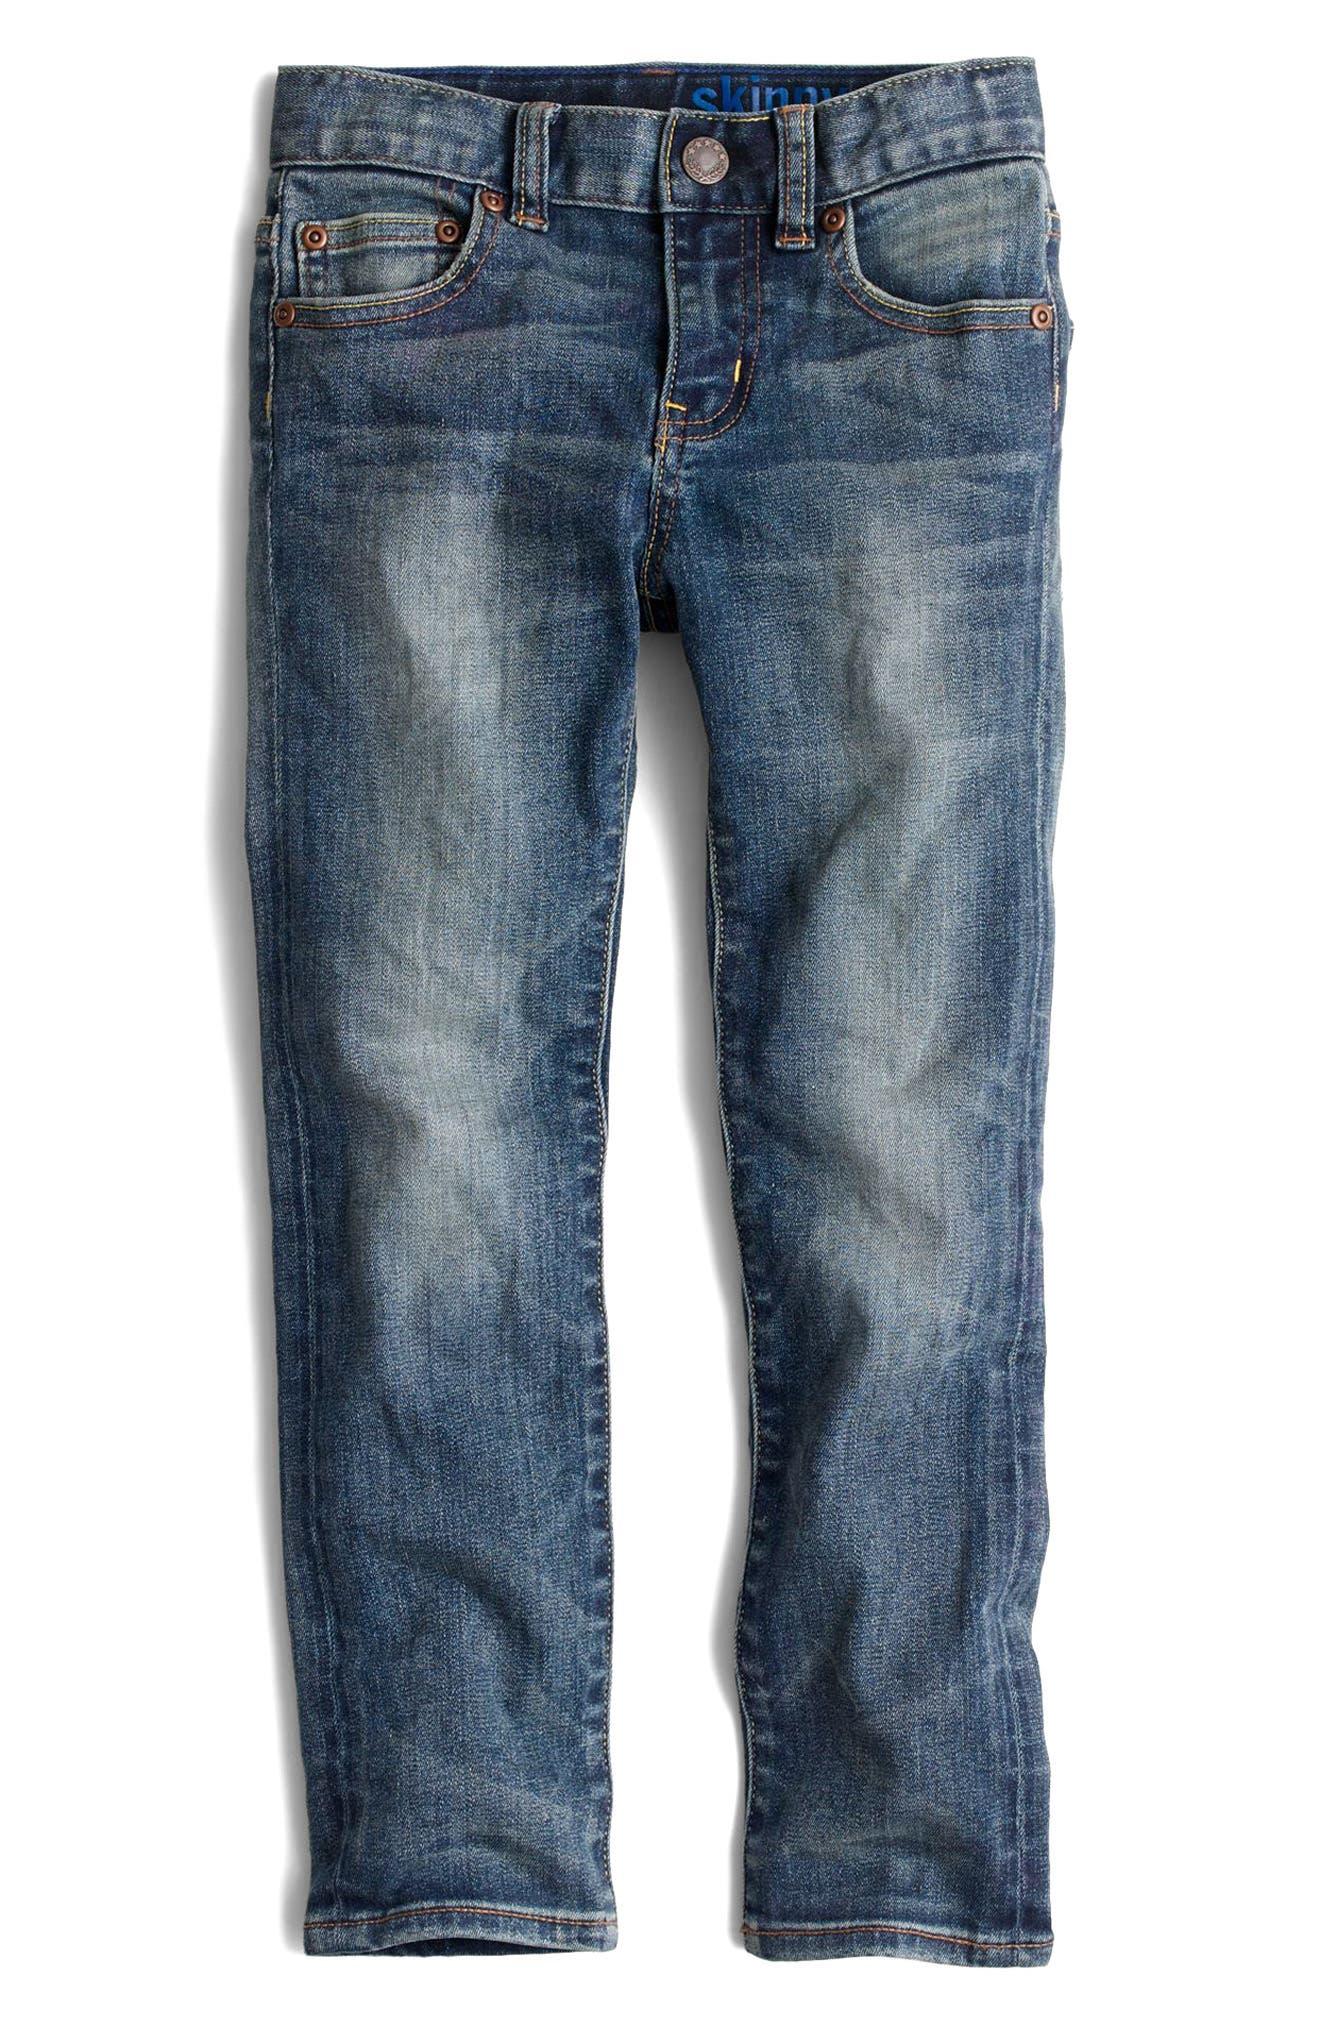 Vintage Wash Stretch Skinny Fit Jeans,                             Main thumbnail 1, color,                             Vintage Wash